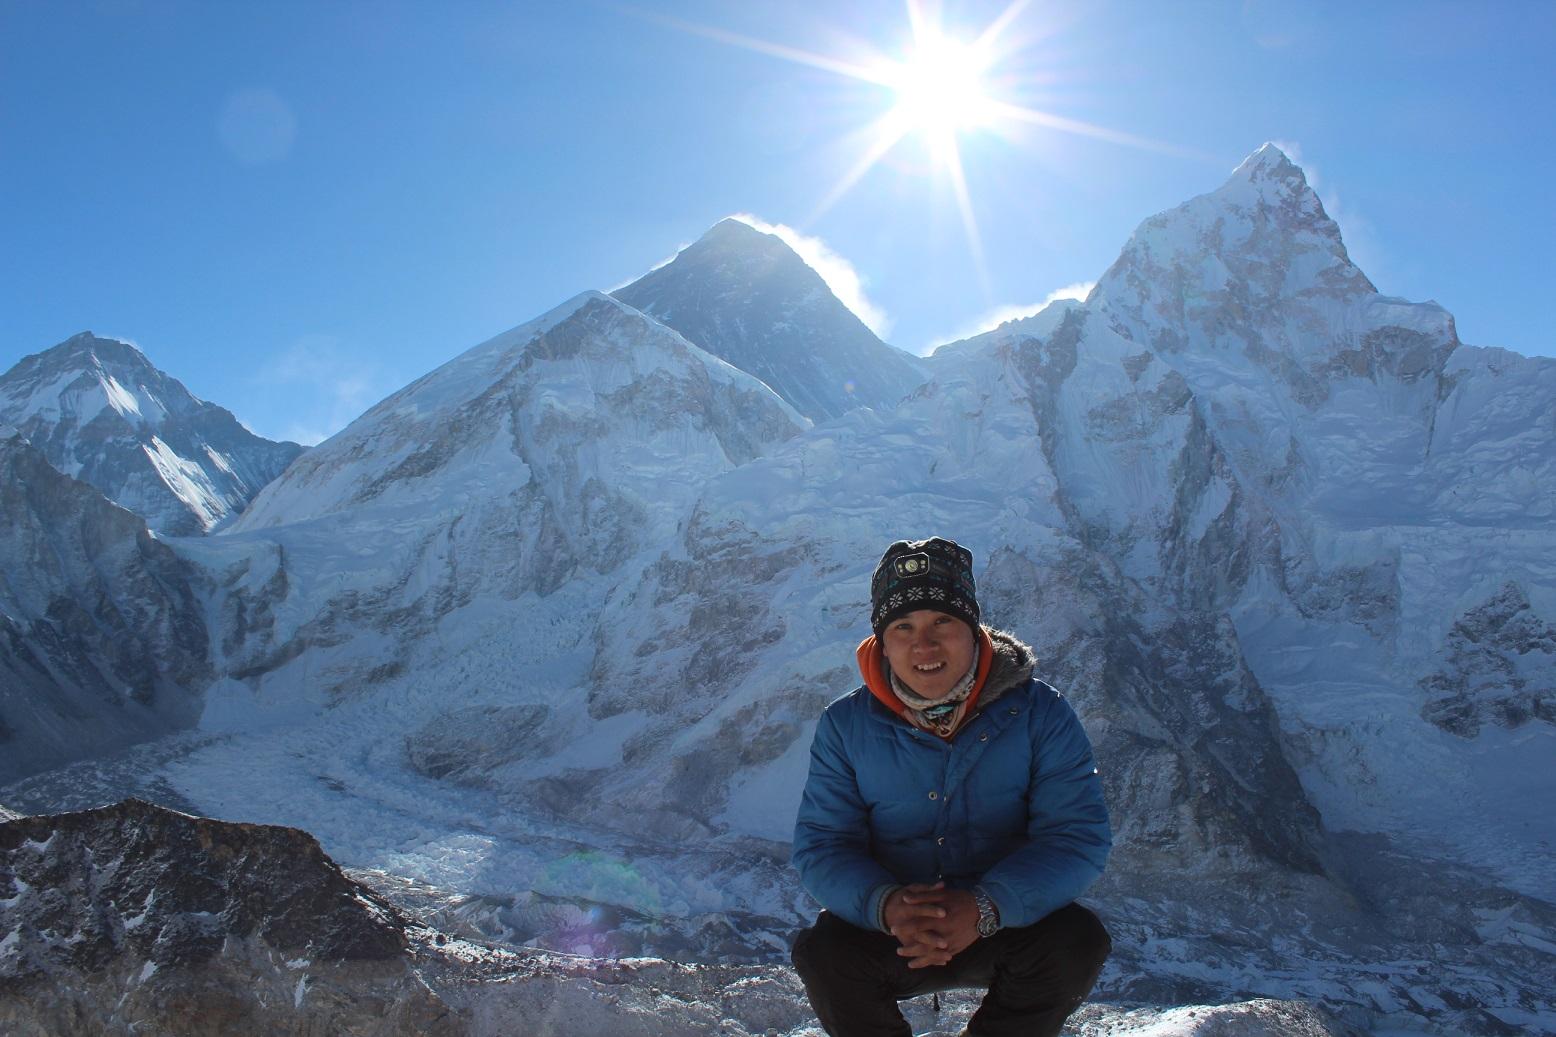 Top Attraction of Everest Base Camp Trek